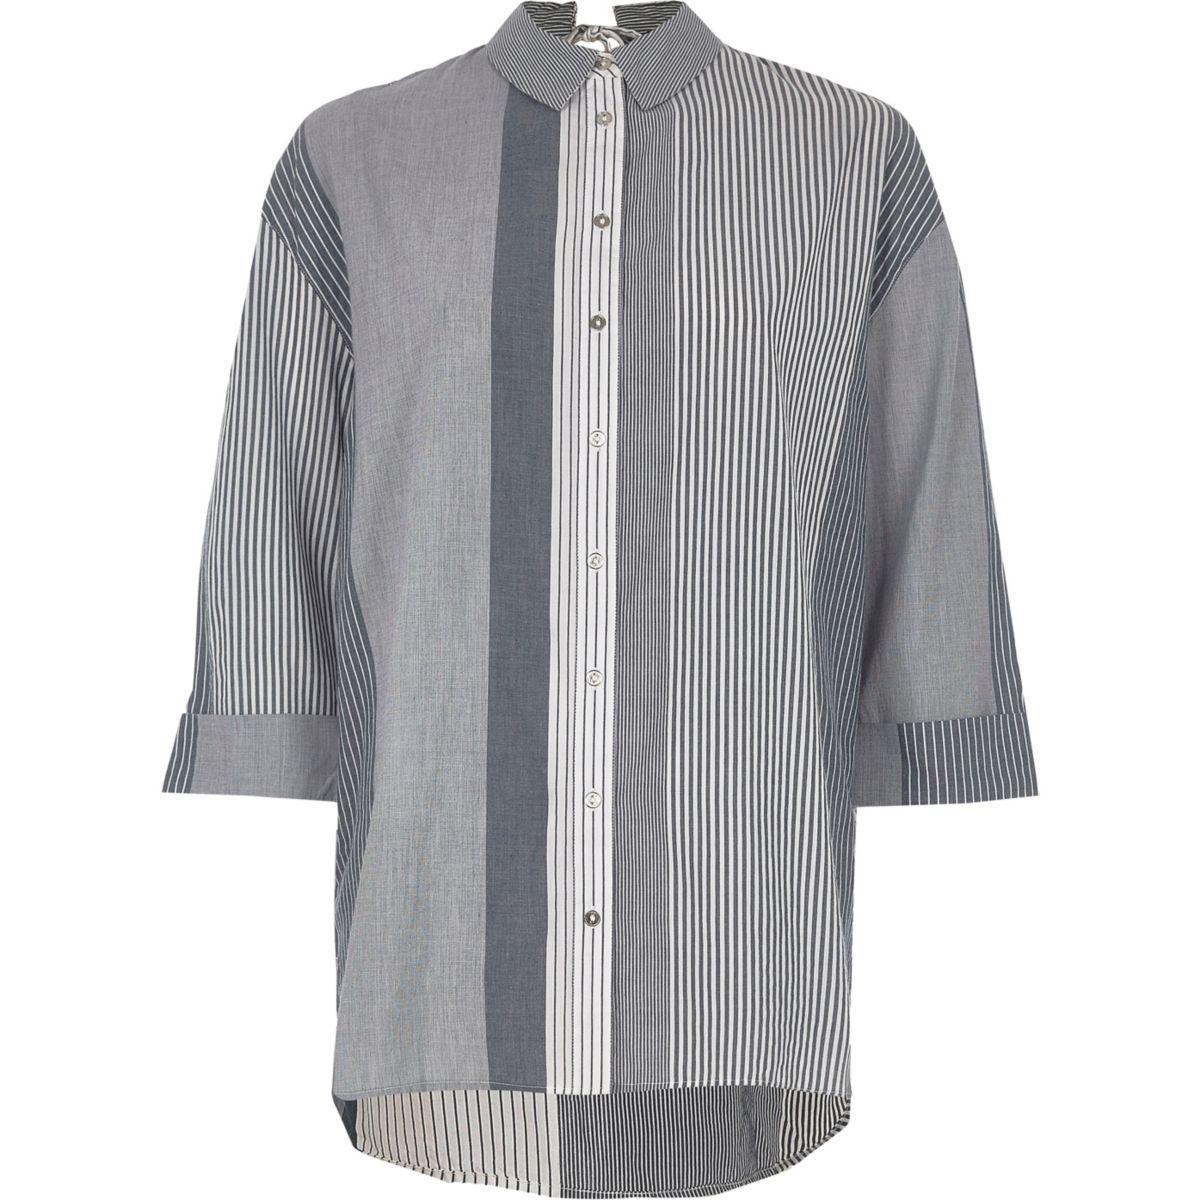 Lyst river island navy stripe tie back shirt navy stripe for How to make a tie back shirt